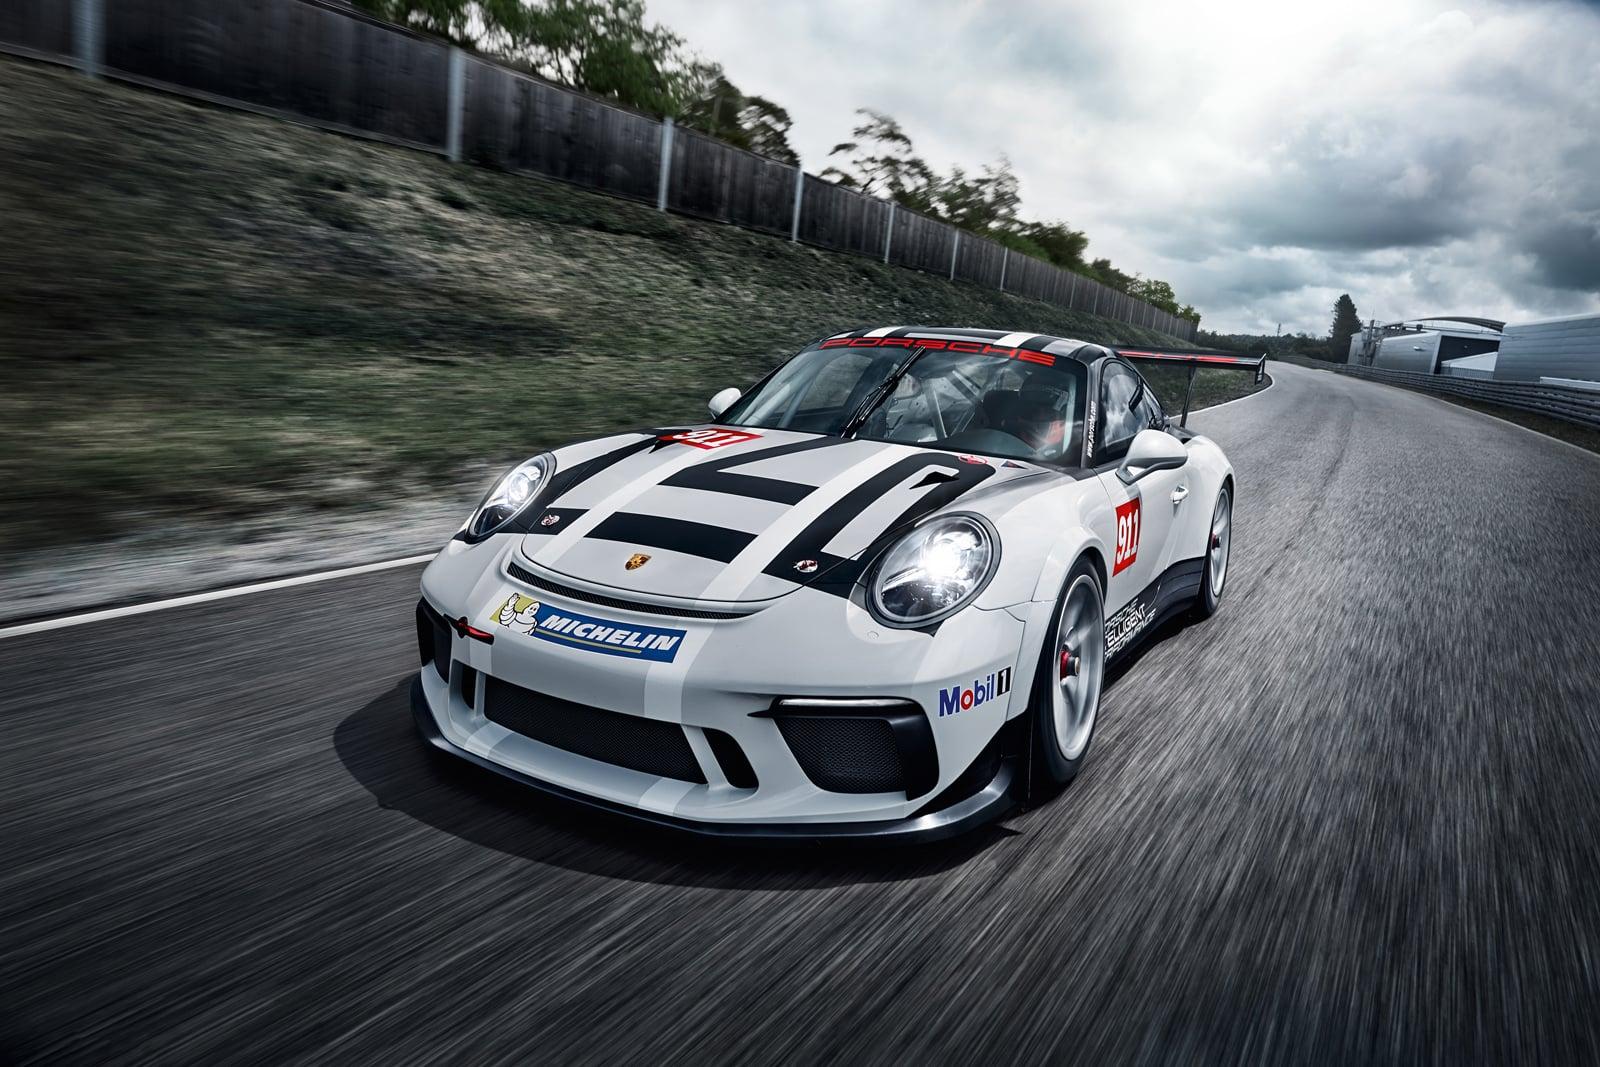 Fotogalerie: Porsche 911 GT3 Cup (2017)